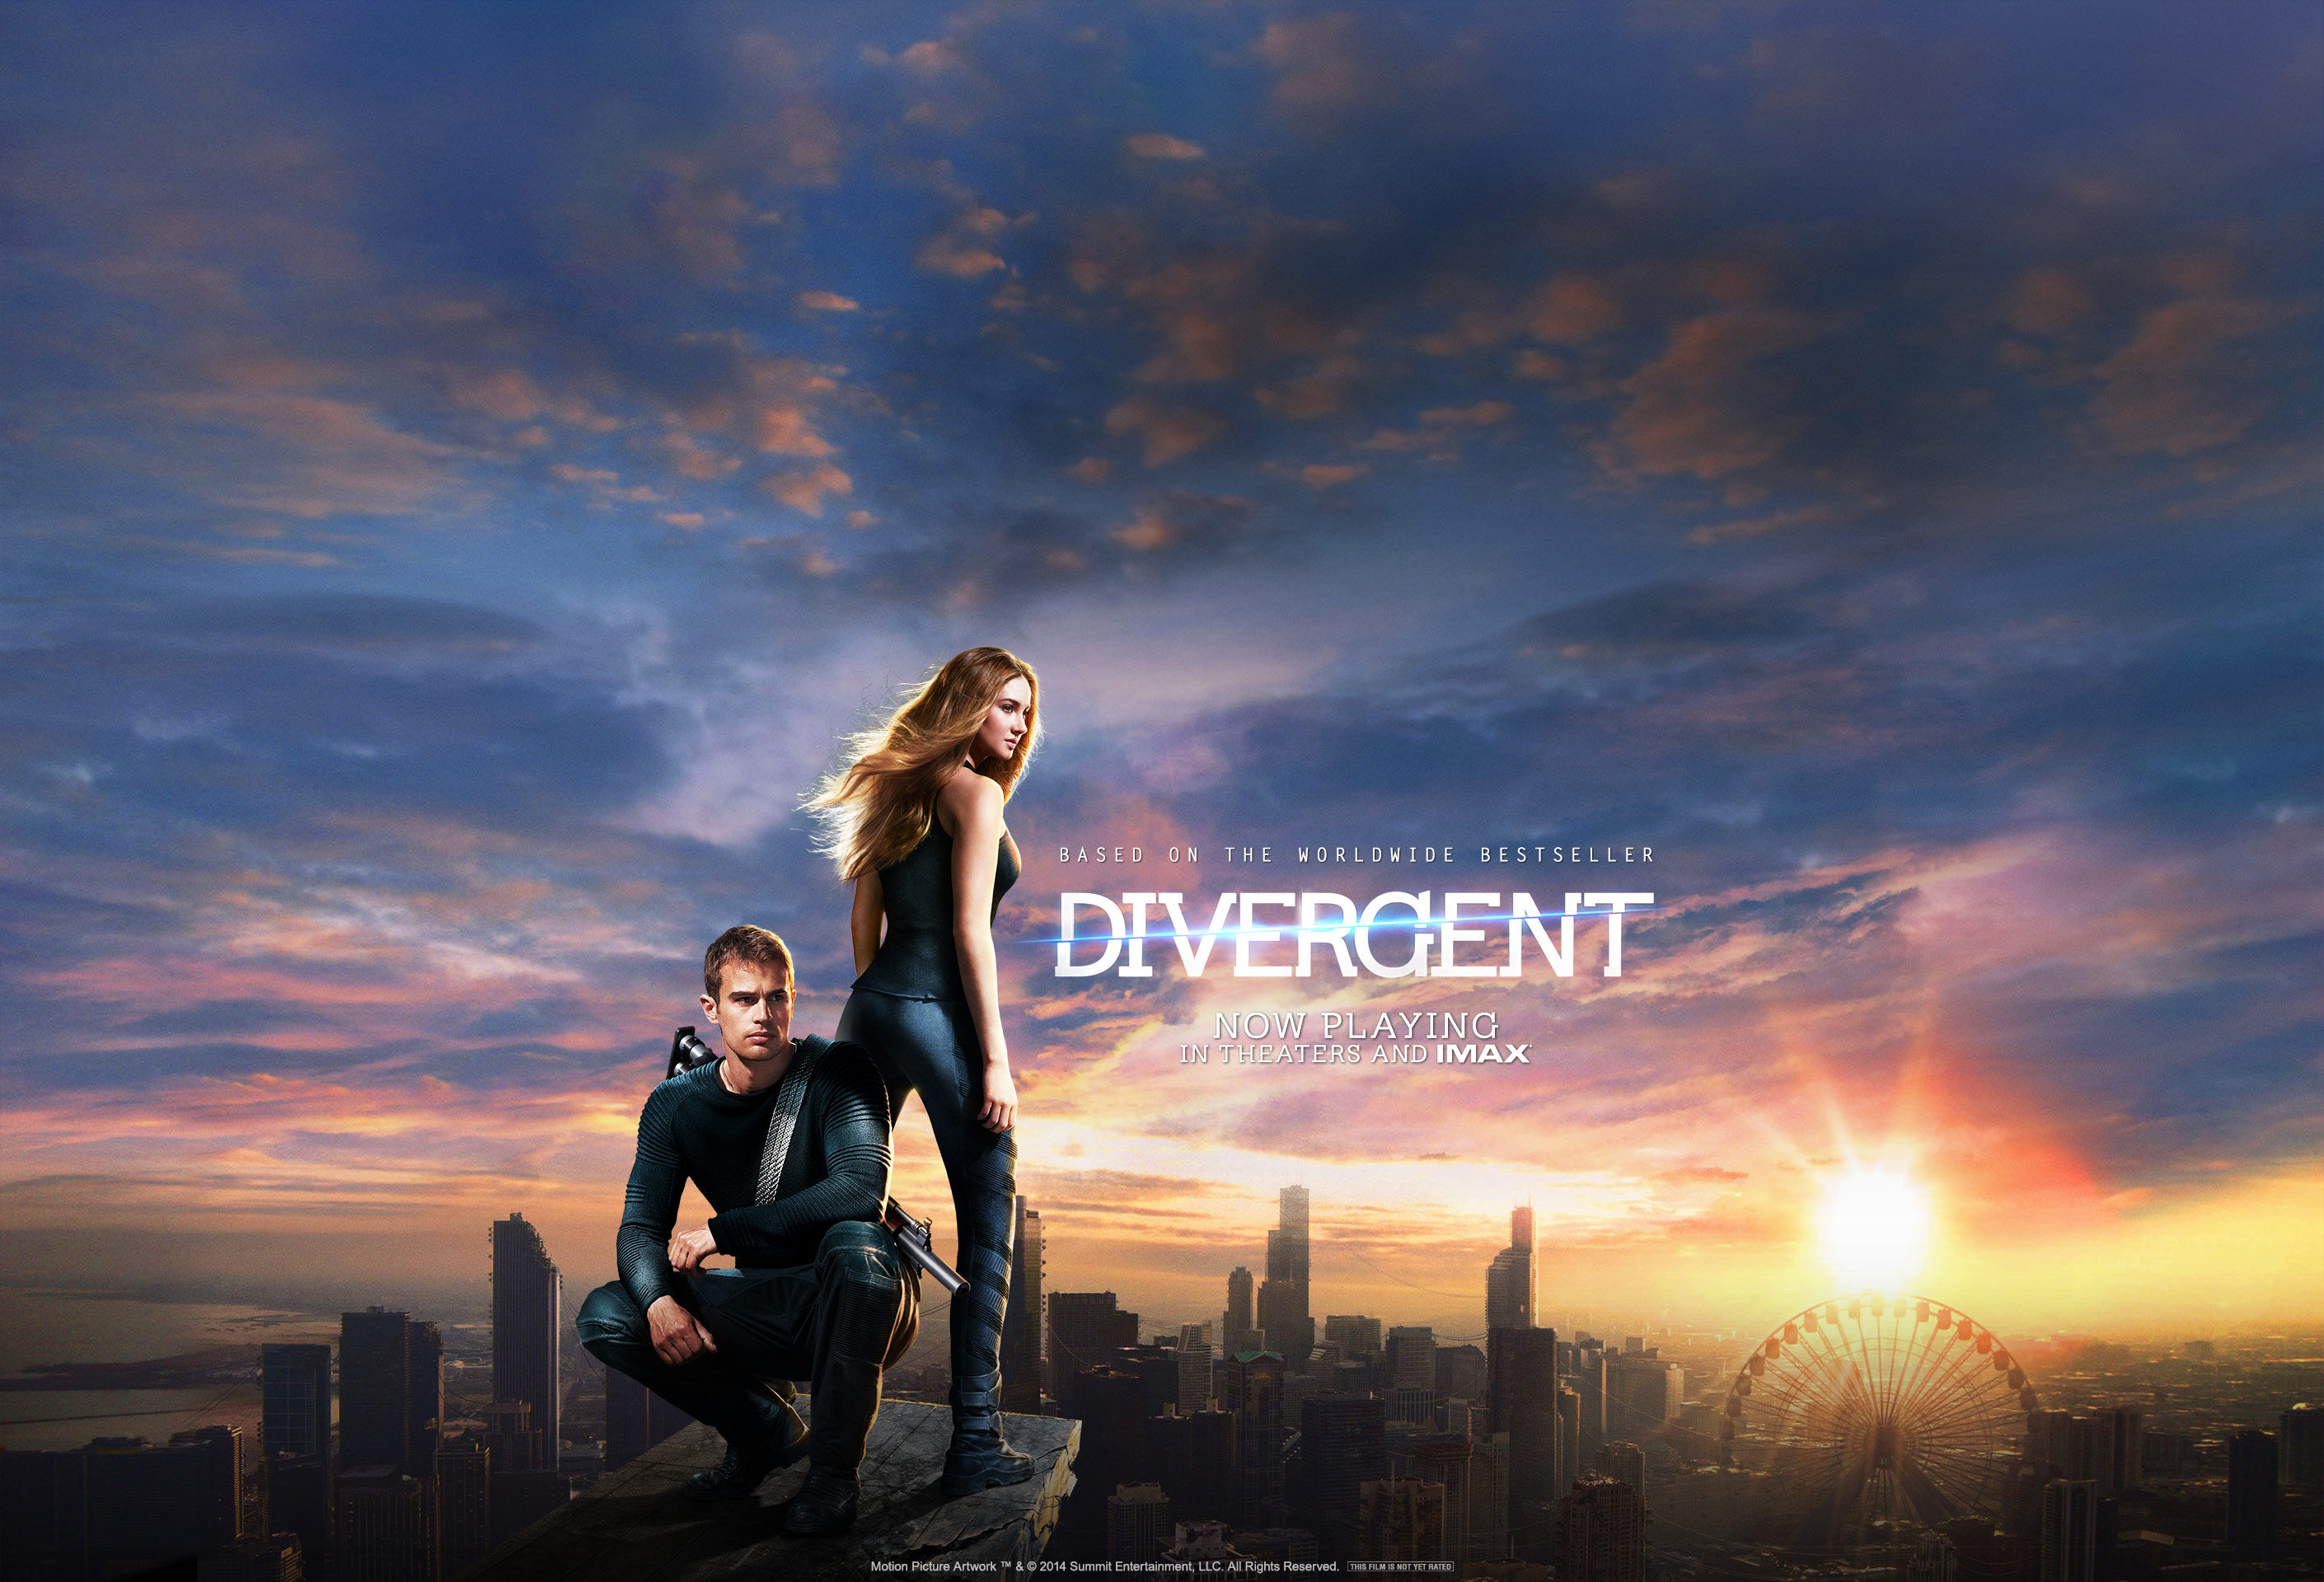 Divergent wallpaper 1 2820x1920